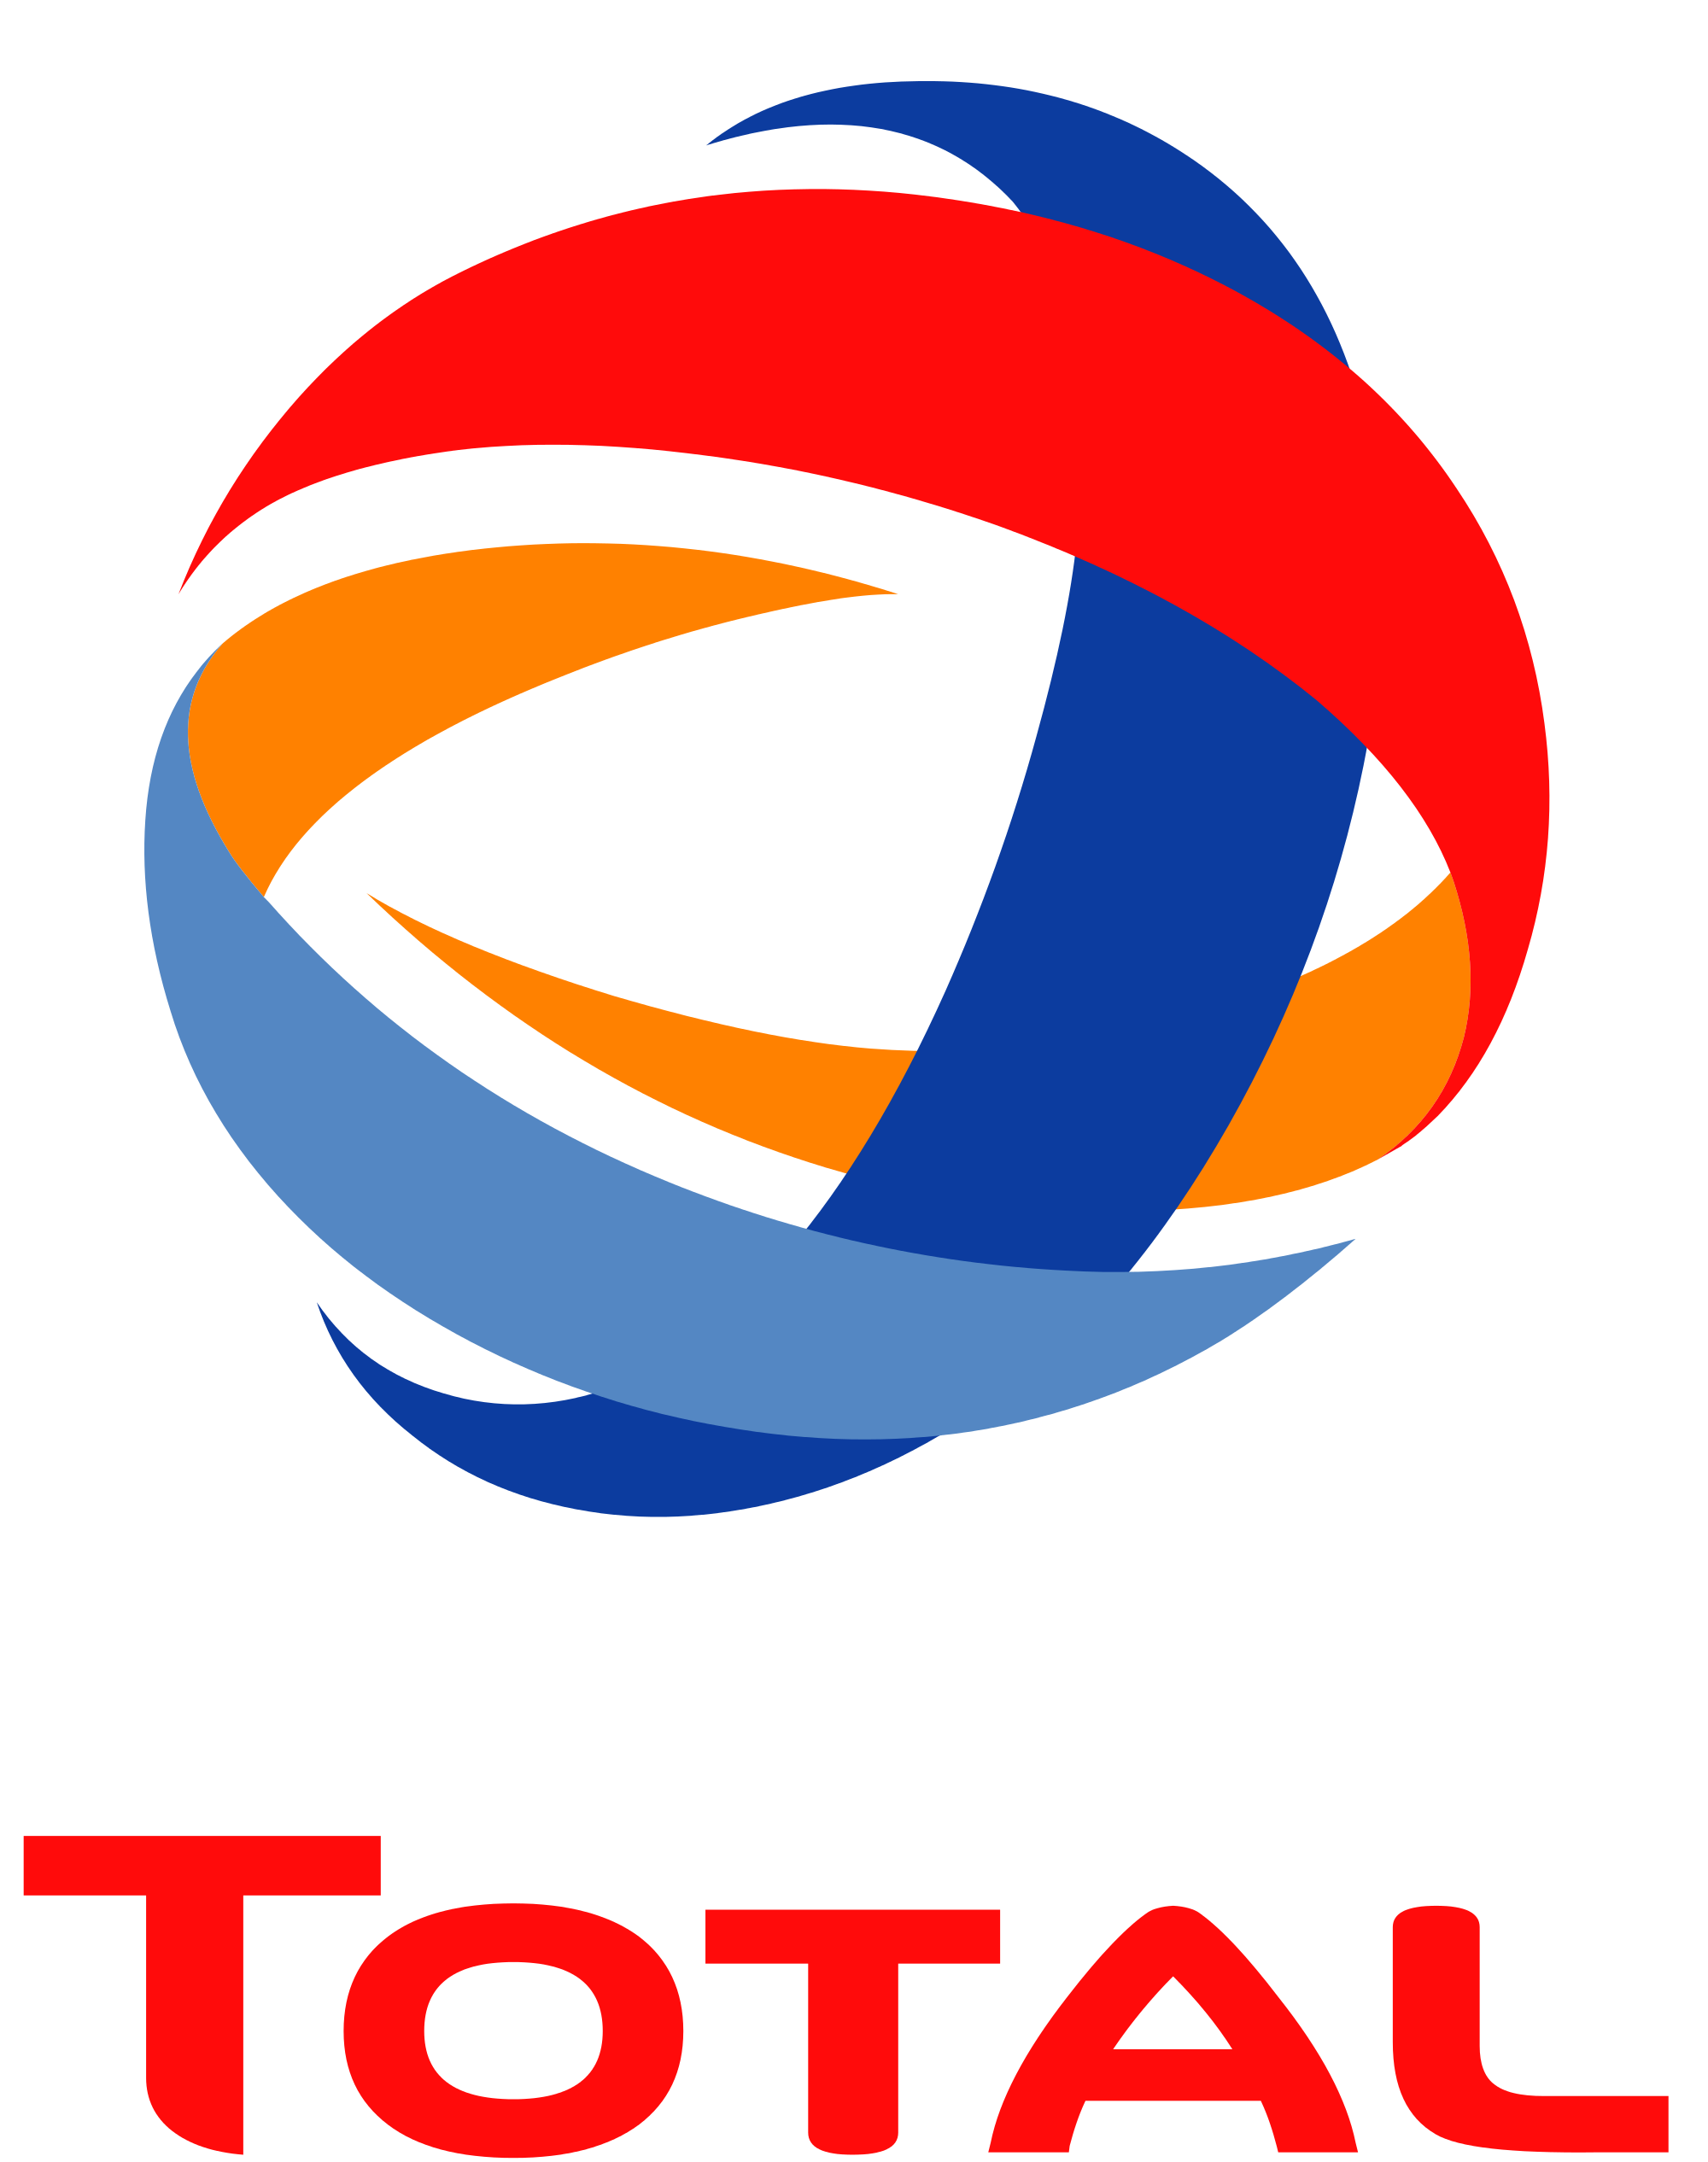 total sa logo energia - Total Logo (Energia)